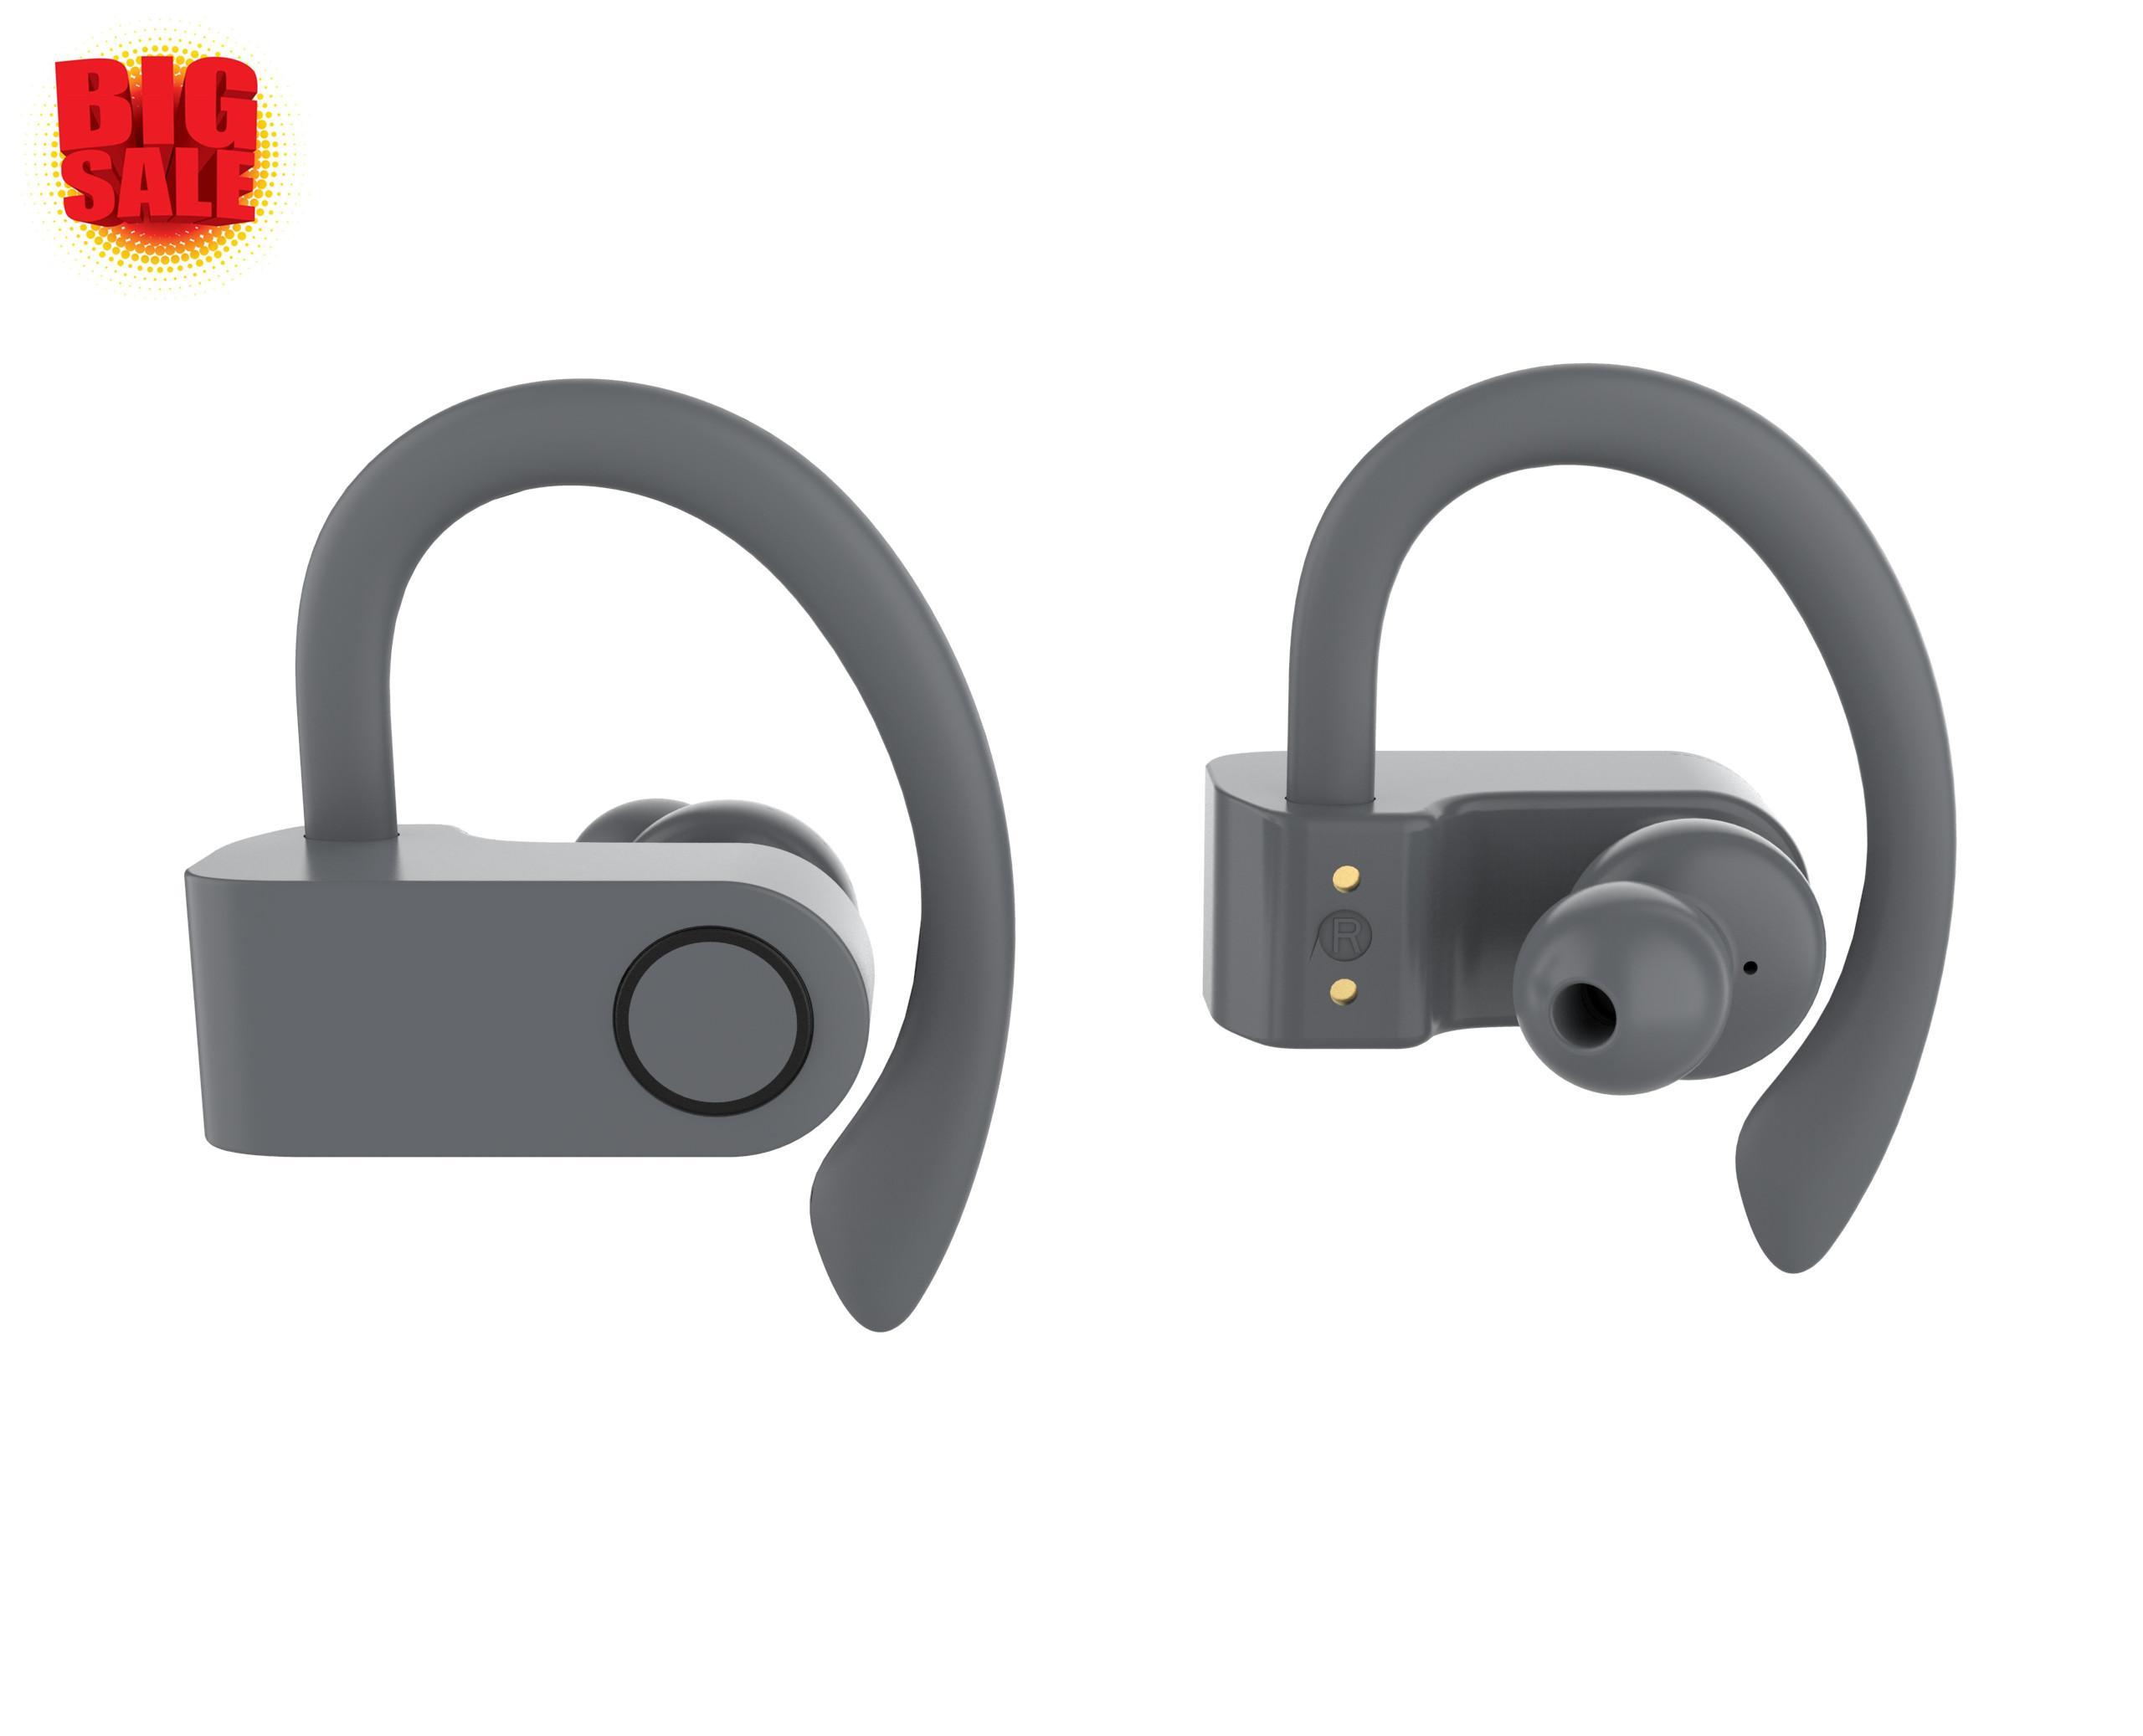 New & Original Audifonos Bluetooth Earphone Earbuds Wholesale Price